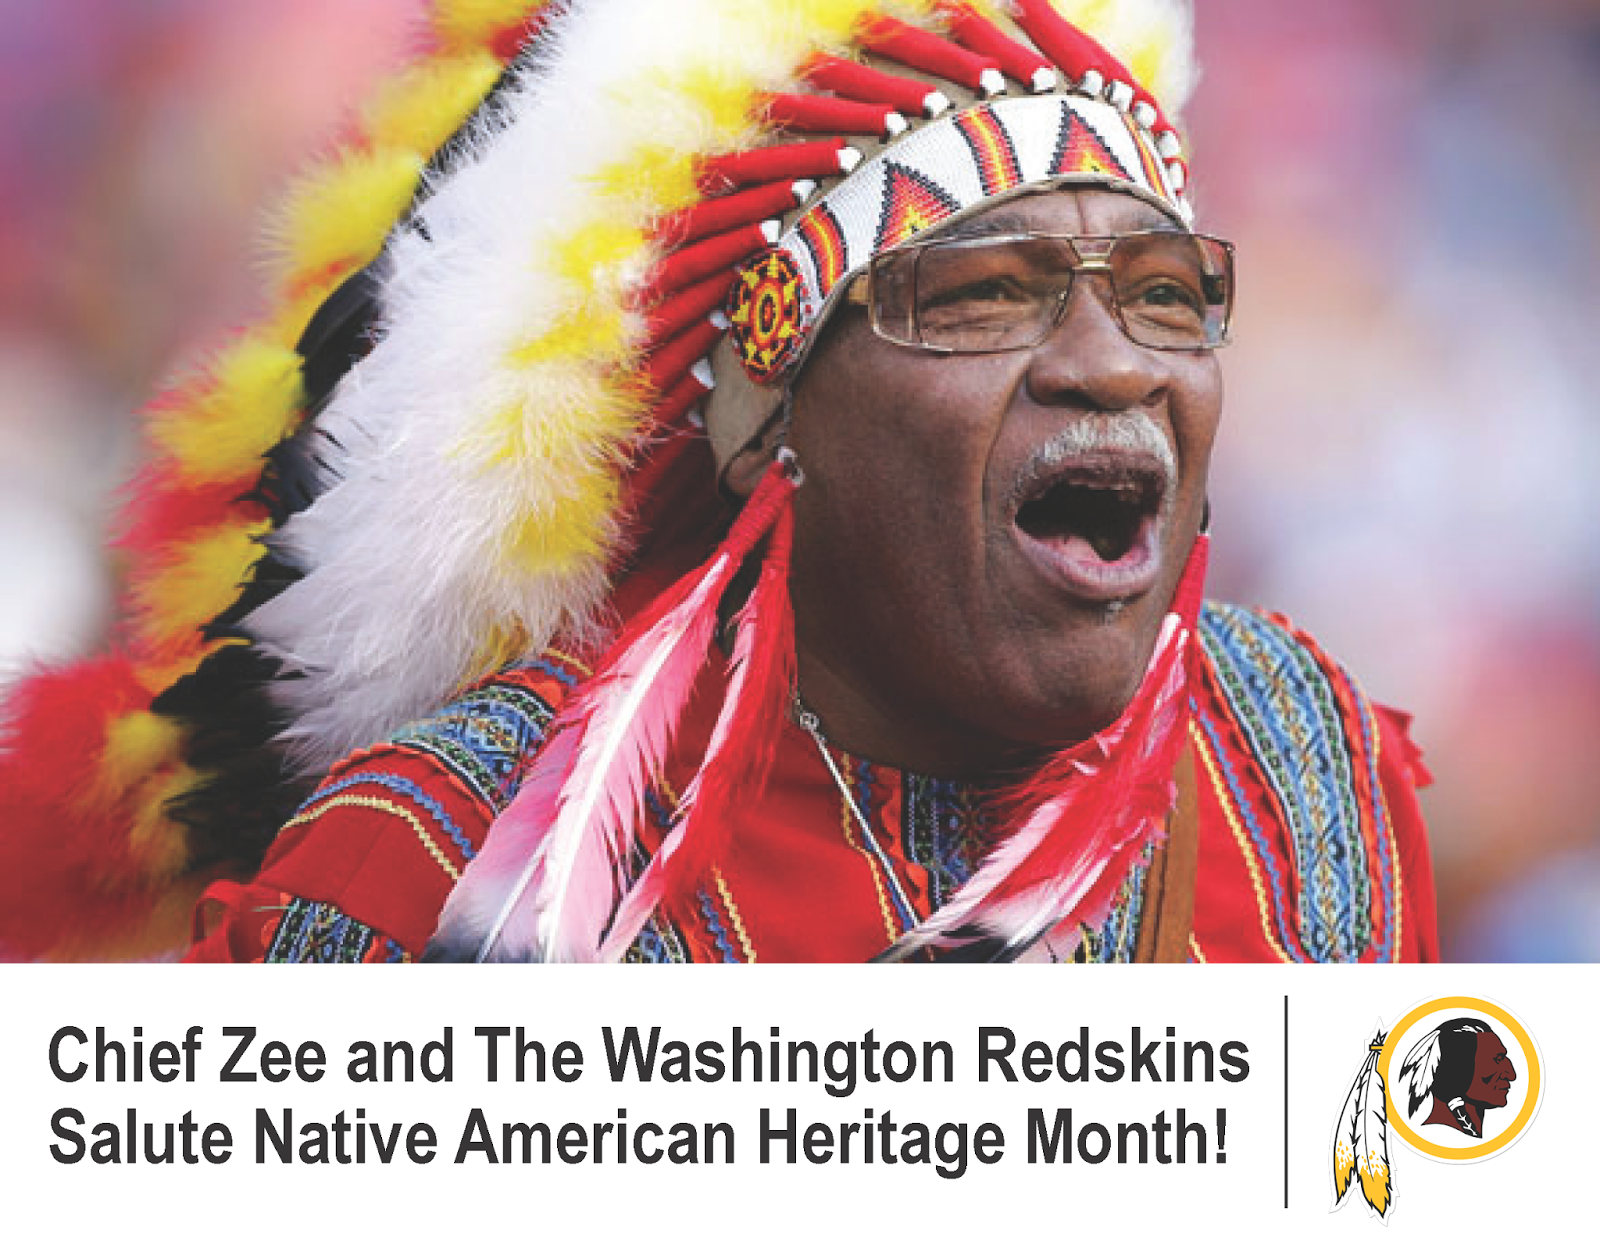 Indians: MultiCultClassics: 12262: Redskins Salute Indians